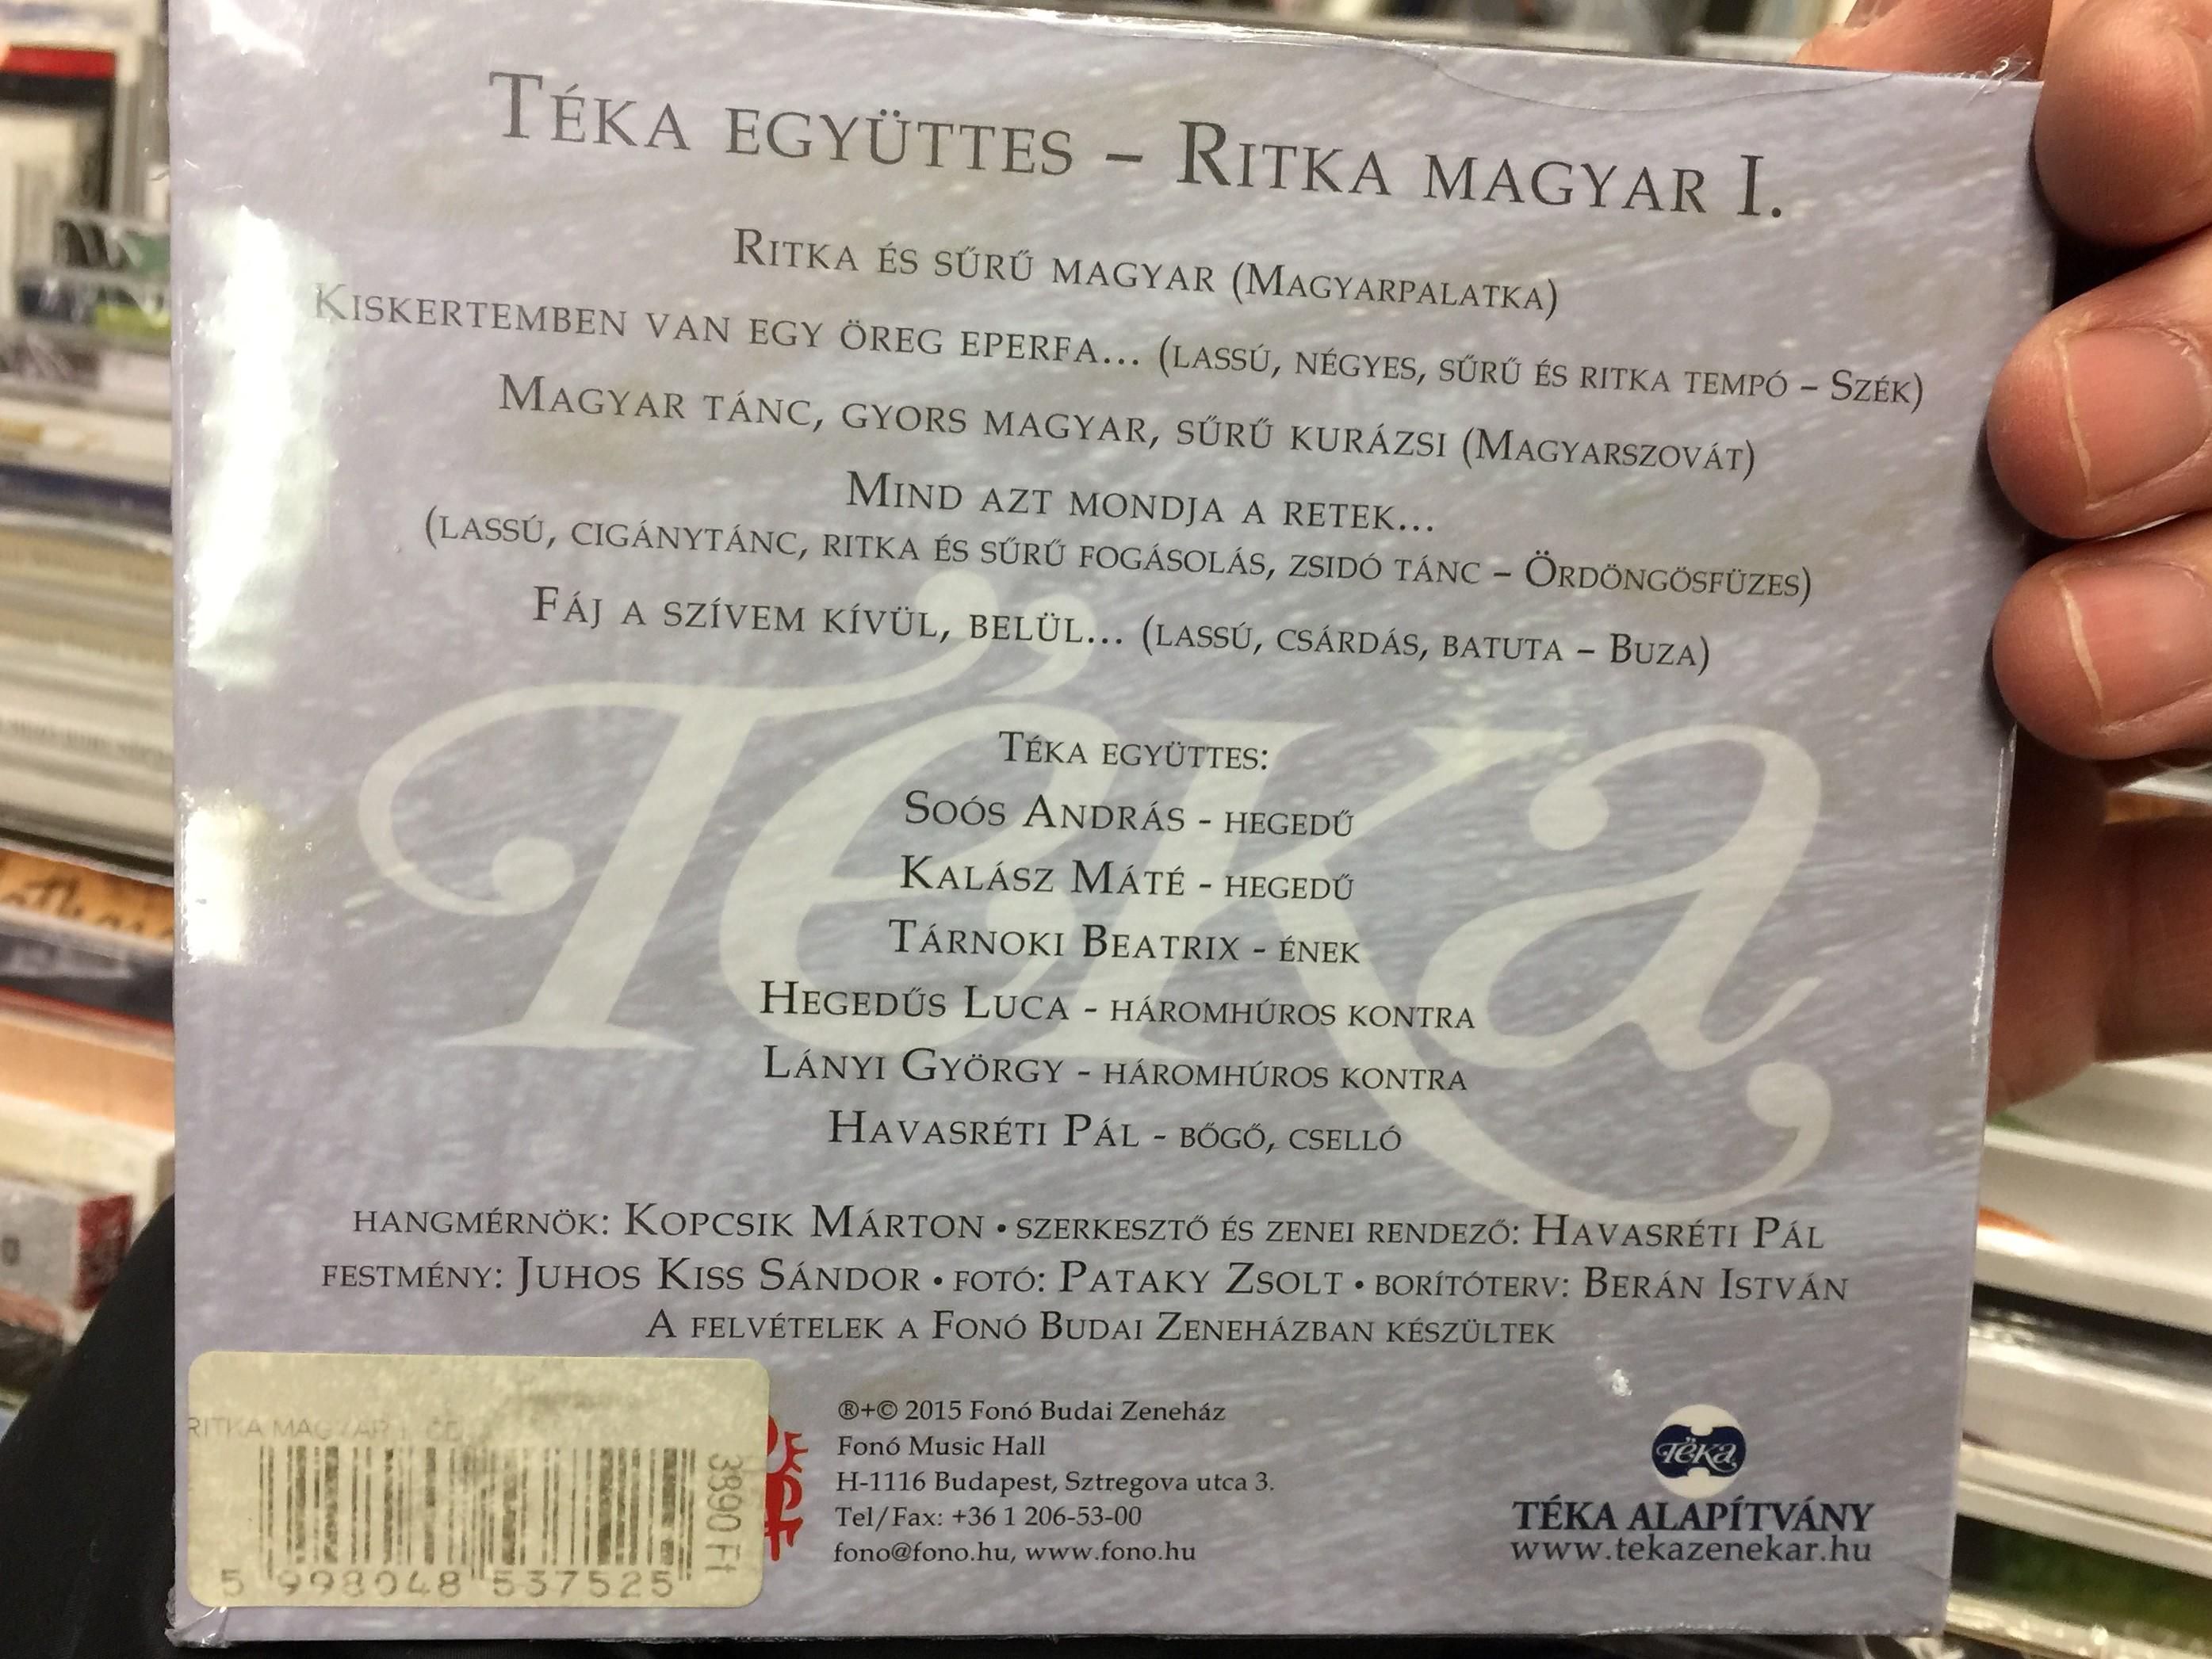 ritka-magyar-i.-t-ka-fon-records-audio-cd-2015-fa-375-2-2-.jpg